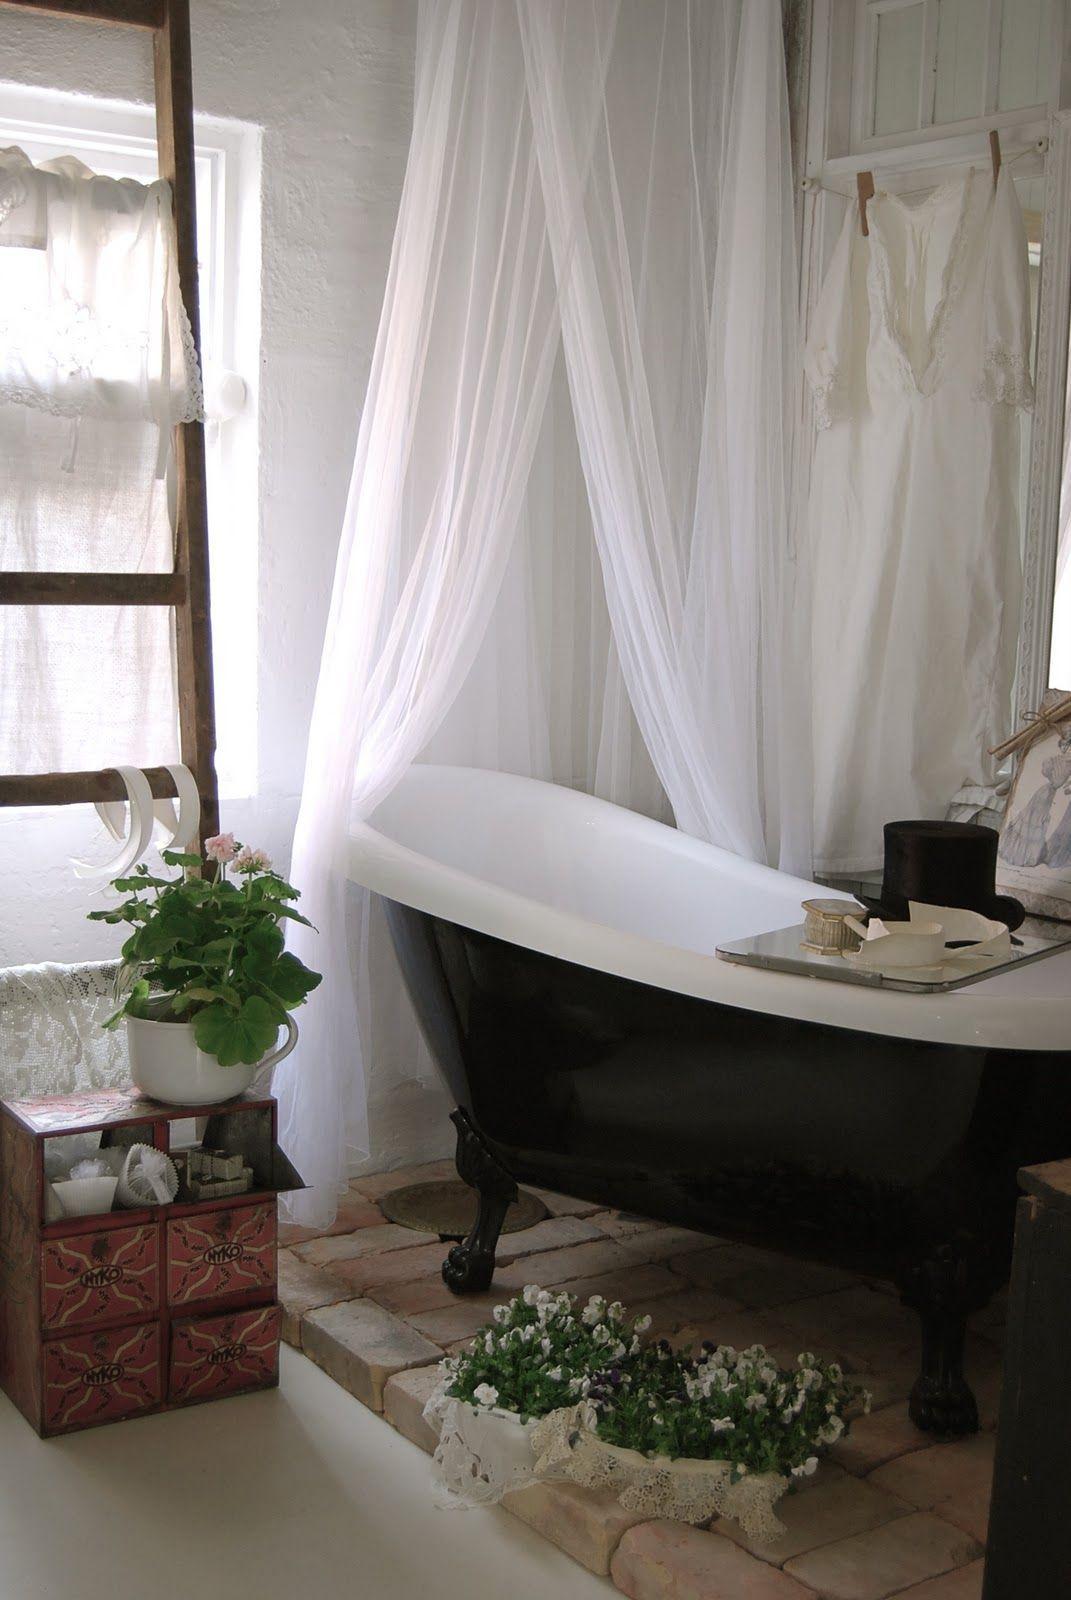 Bath under window ideas  clawfoot tub bricks plants shower curtain love it all  bathtubs